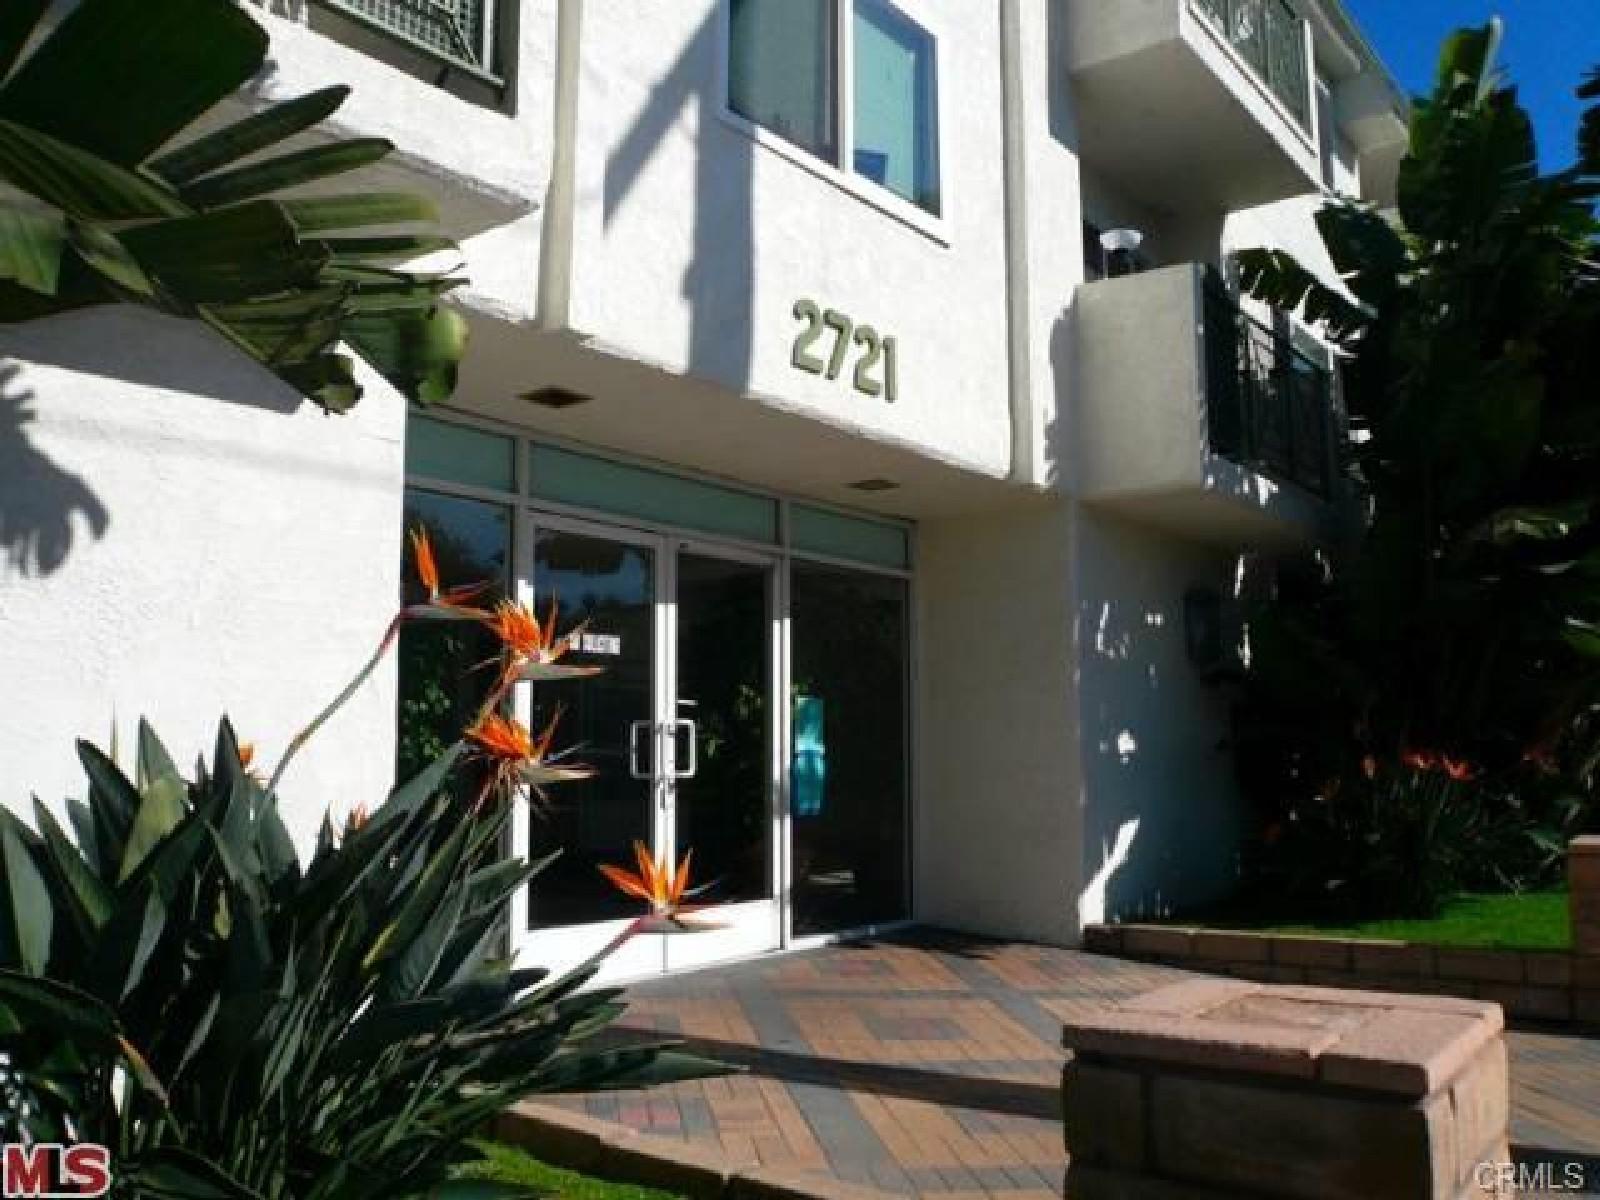 Condominium for Sale at 2721 2nd St # 215, Santa Monica 90405 2721 2nd Street #215 Santa Monica, California, 90405 United States